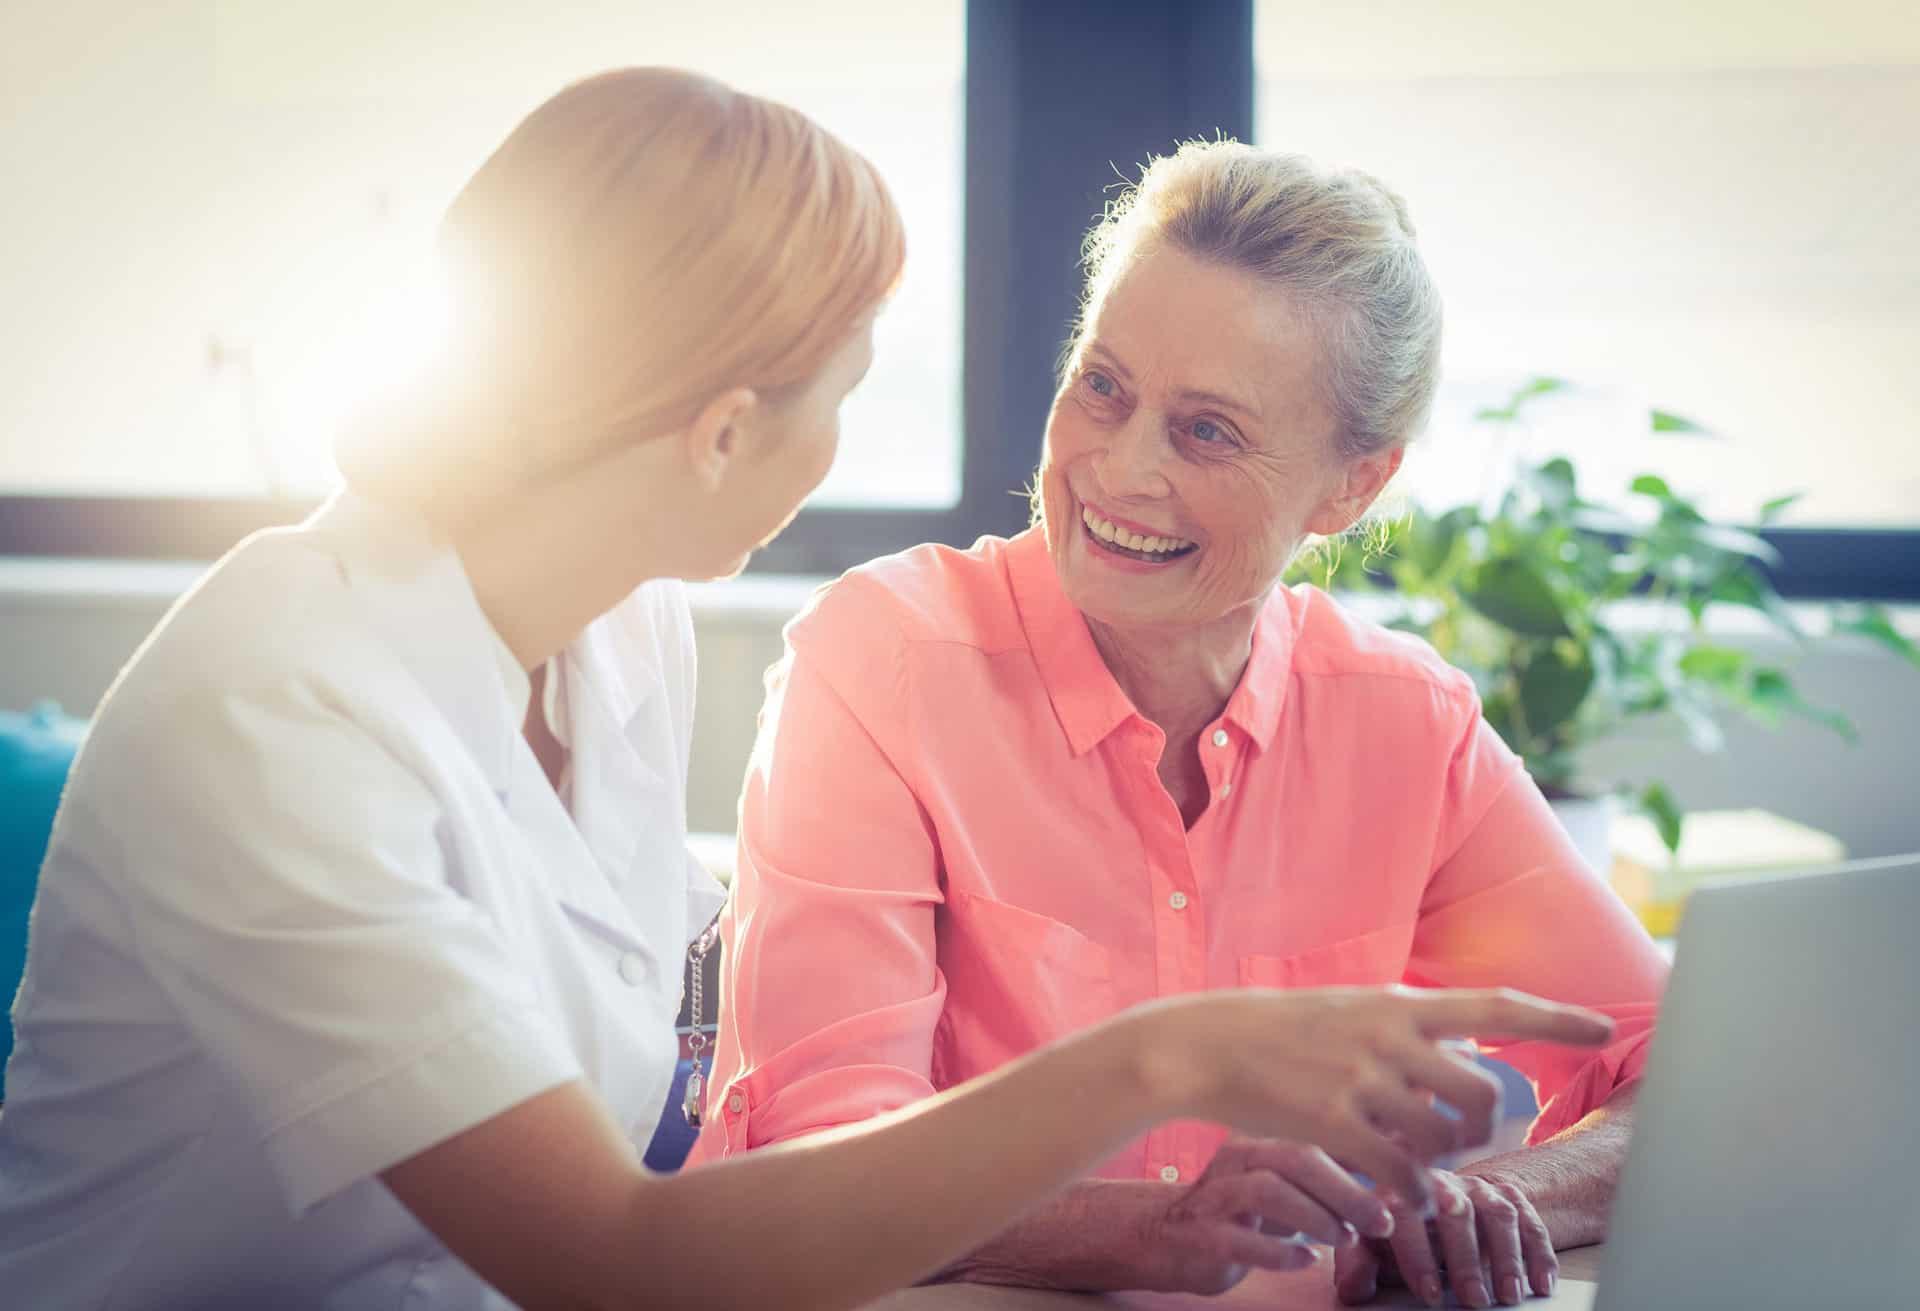 Smiling senior woman speaking with caregiver.